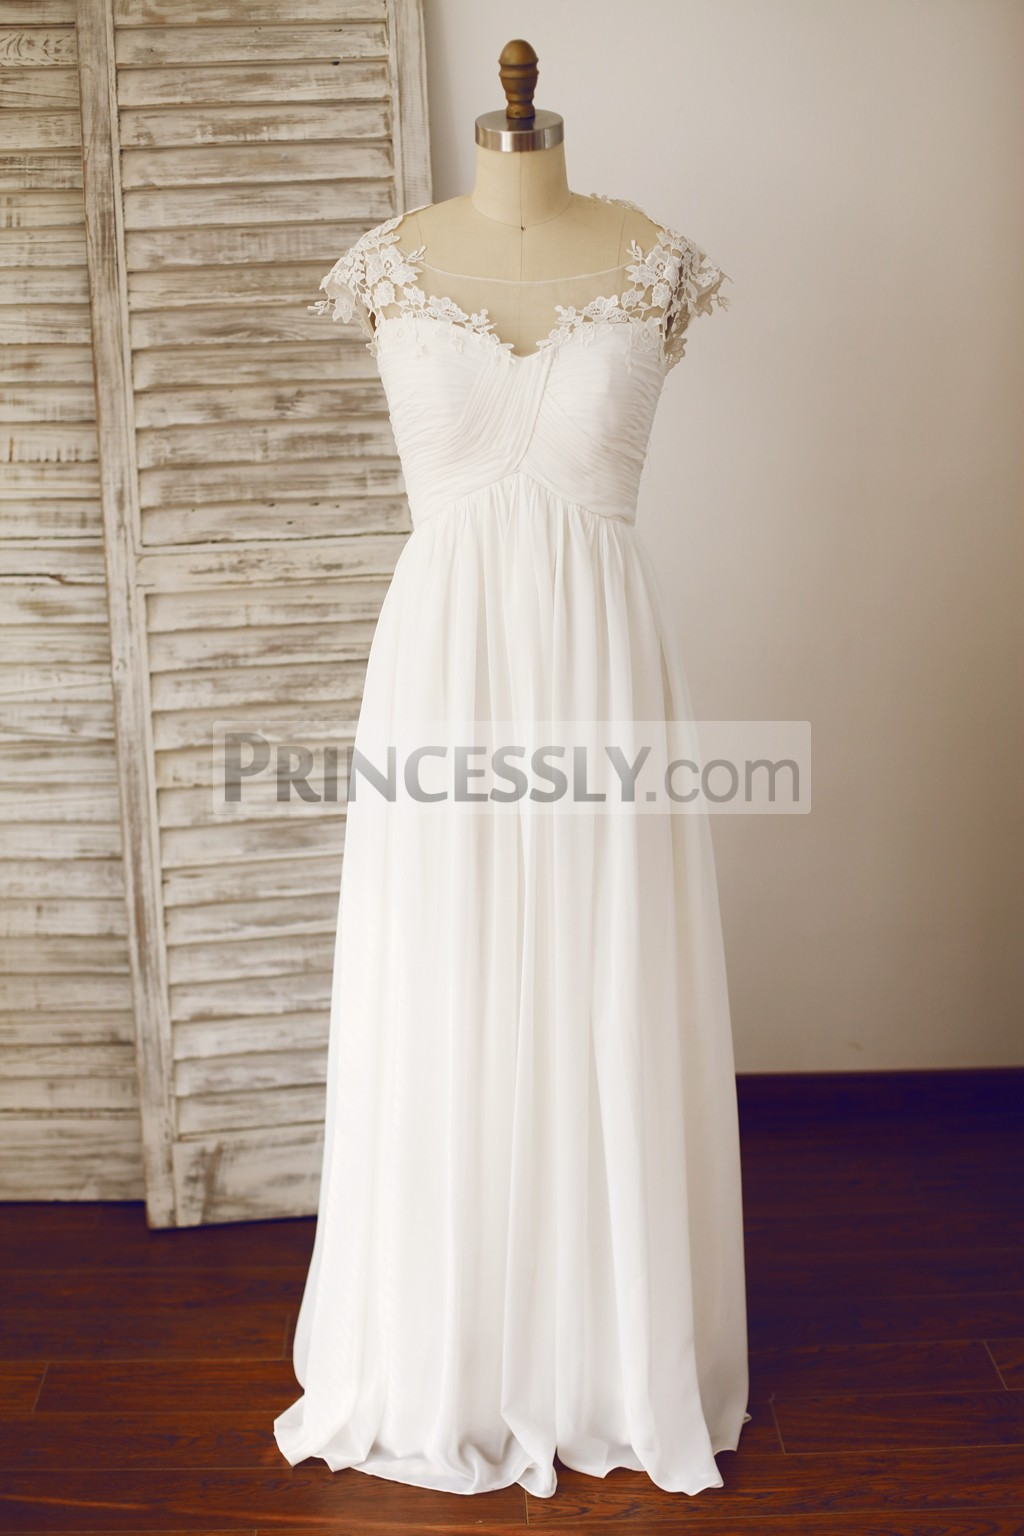 Princessly.com-K1003333 Sheer Illusion Neckline Chiffon Lace Wedding Dress-31